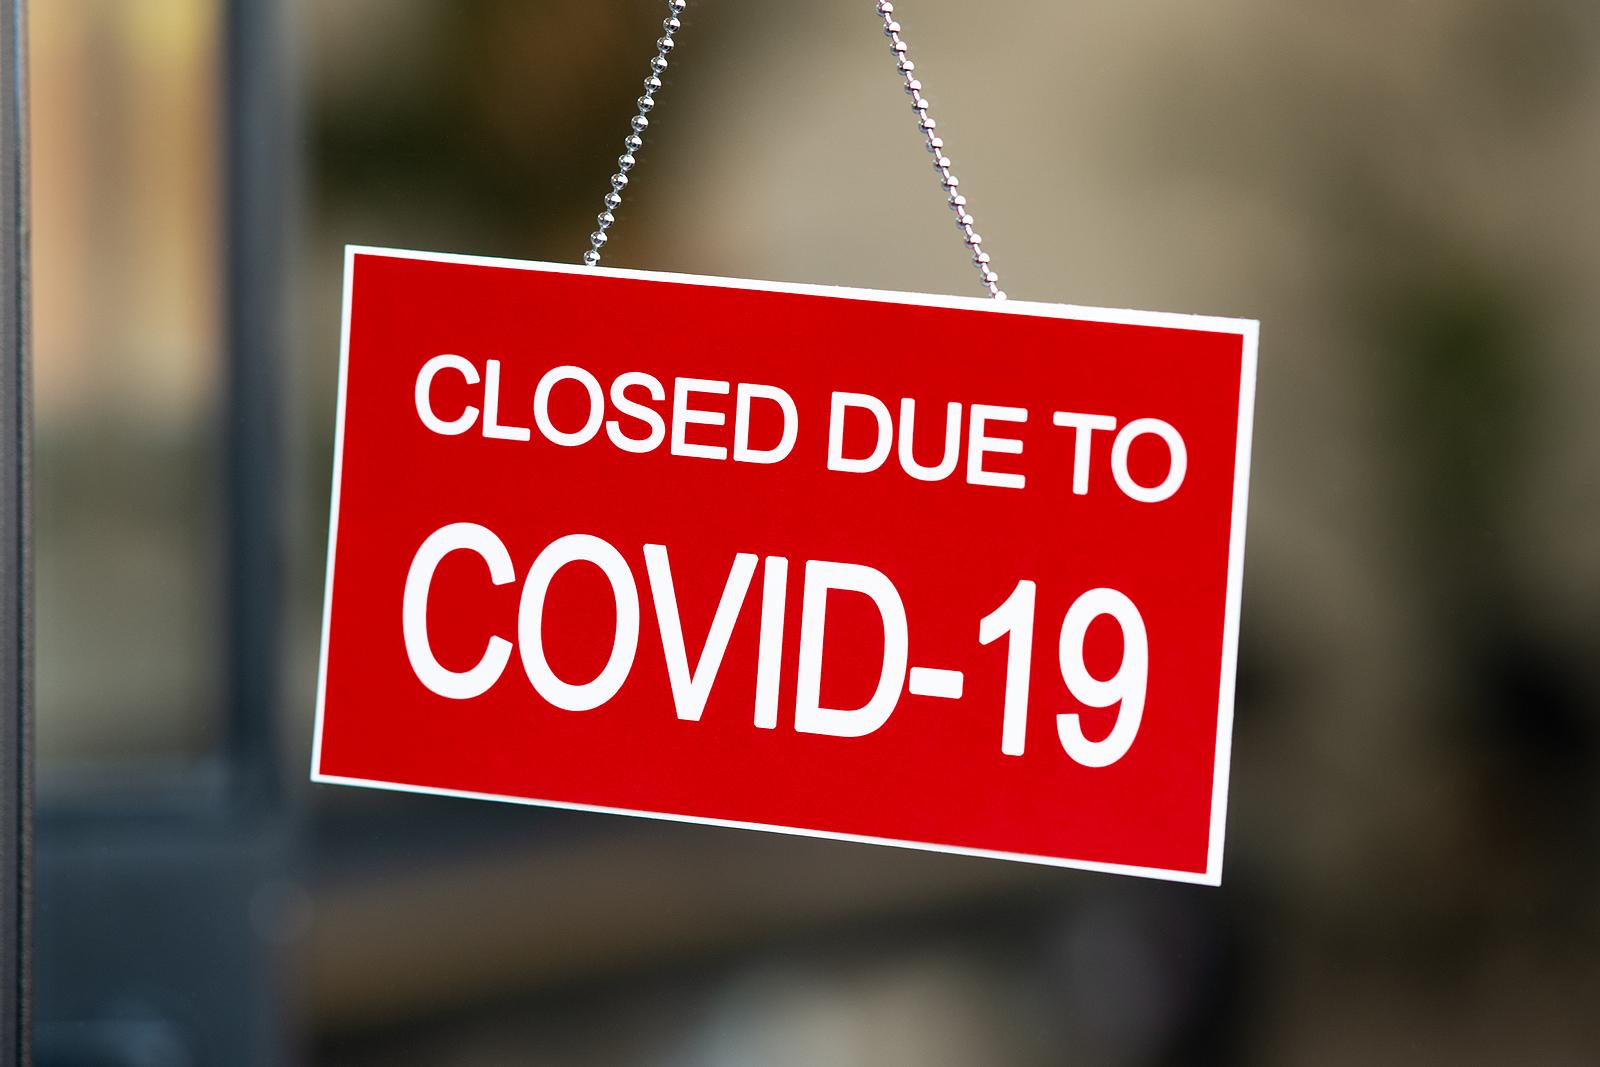 At Tiffanys Closed